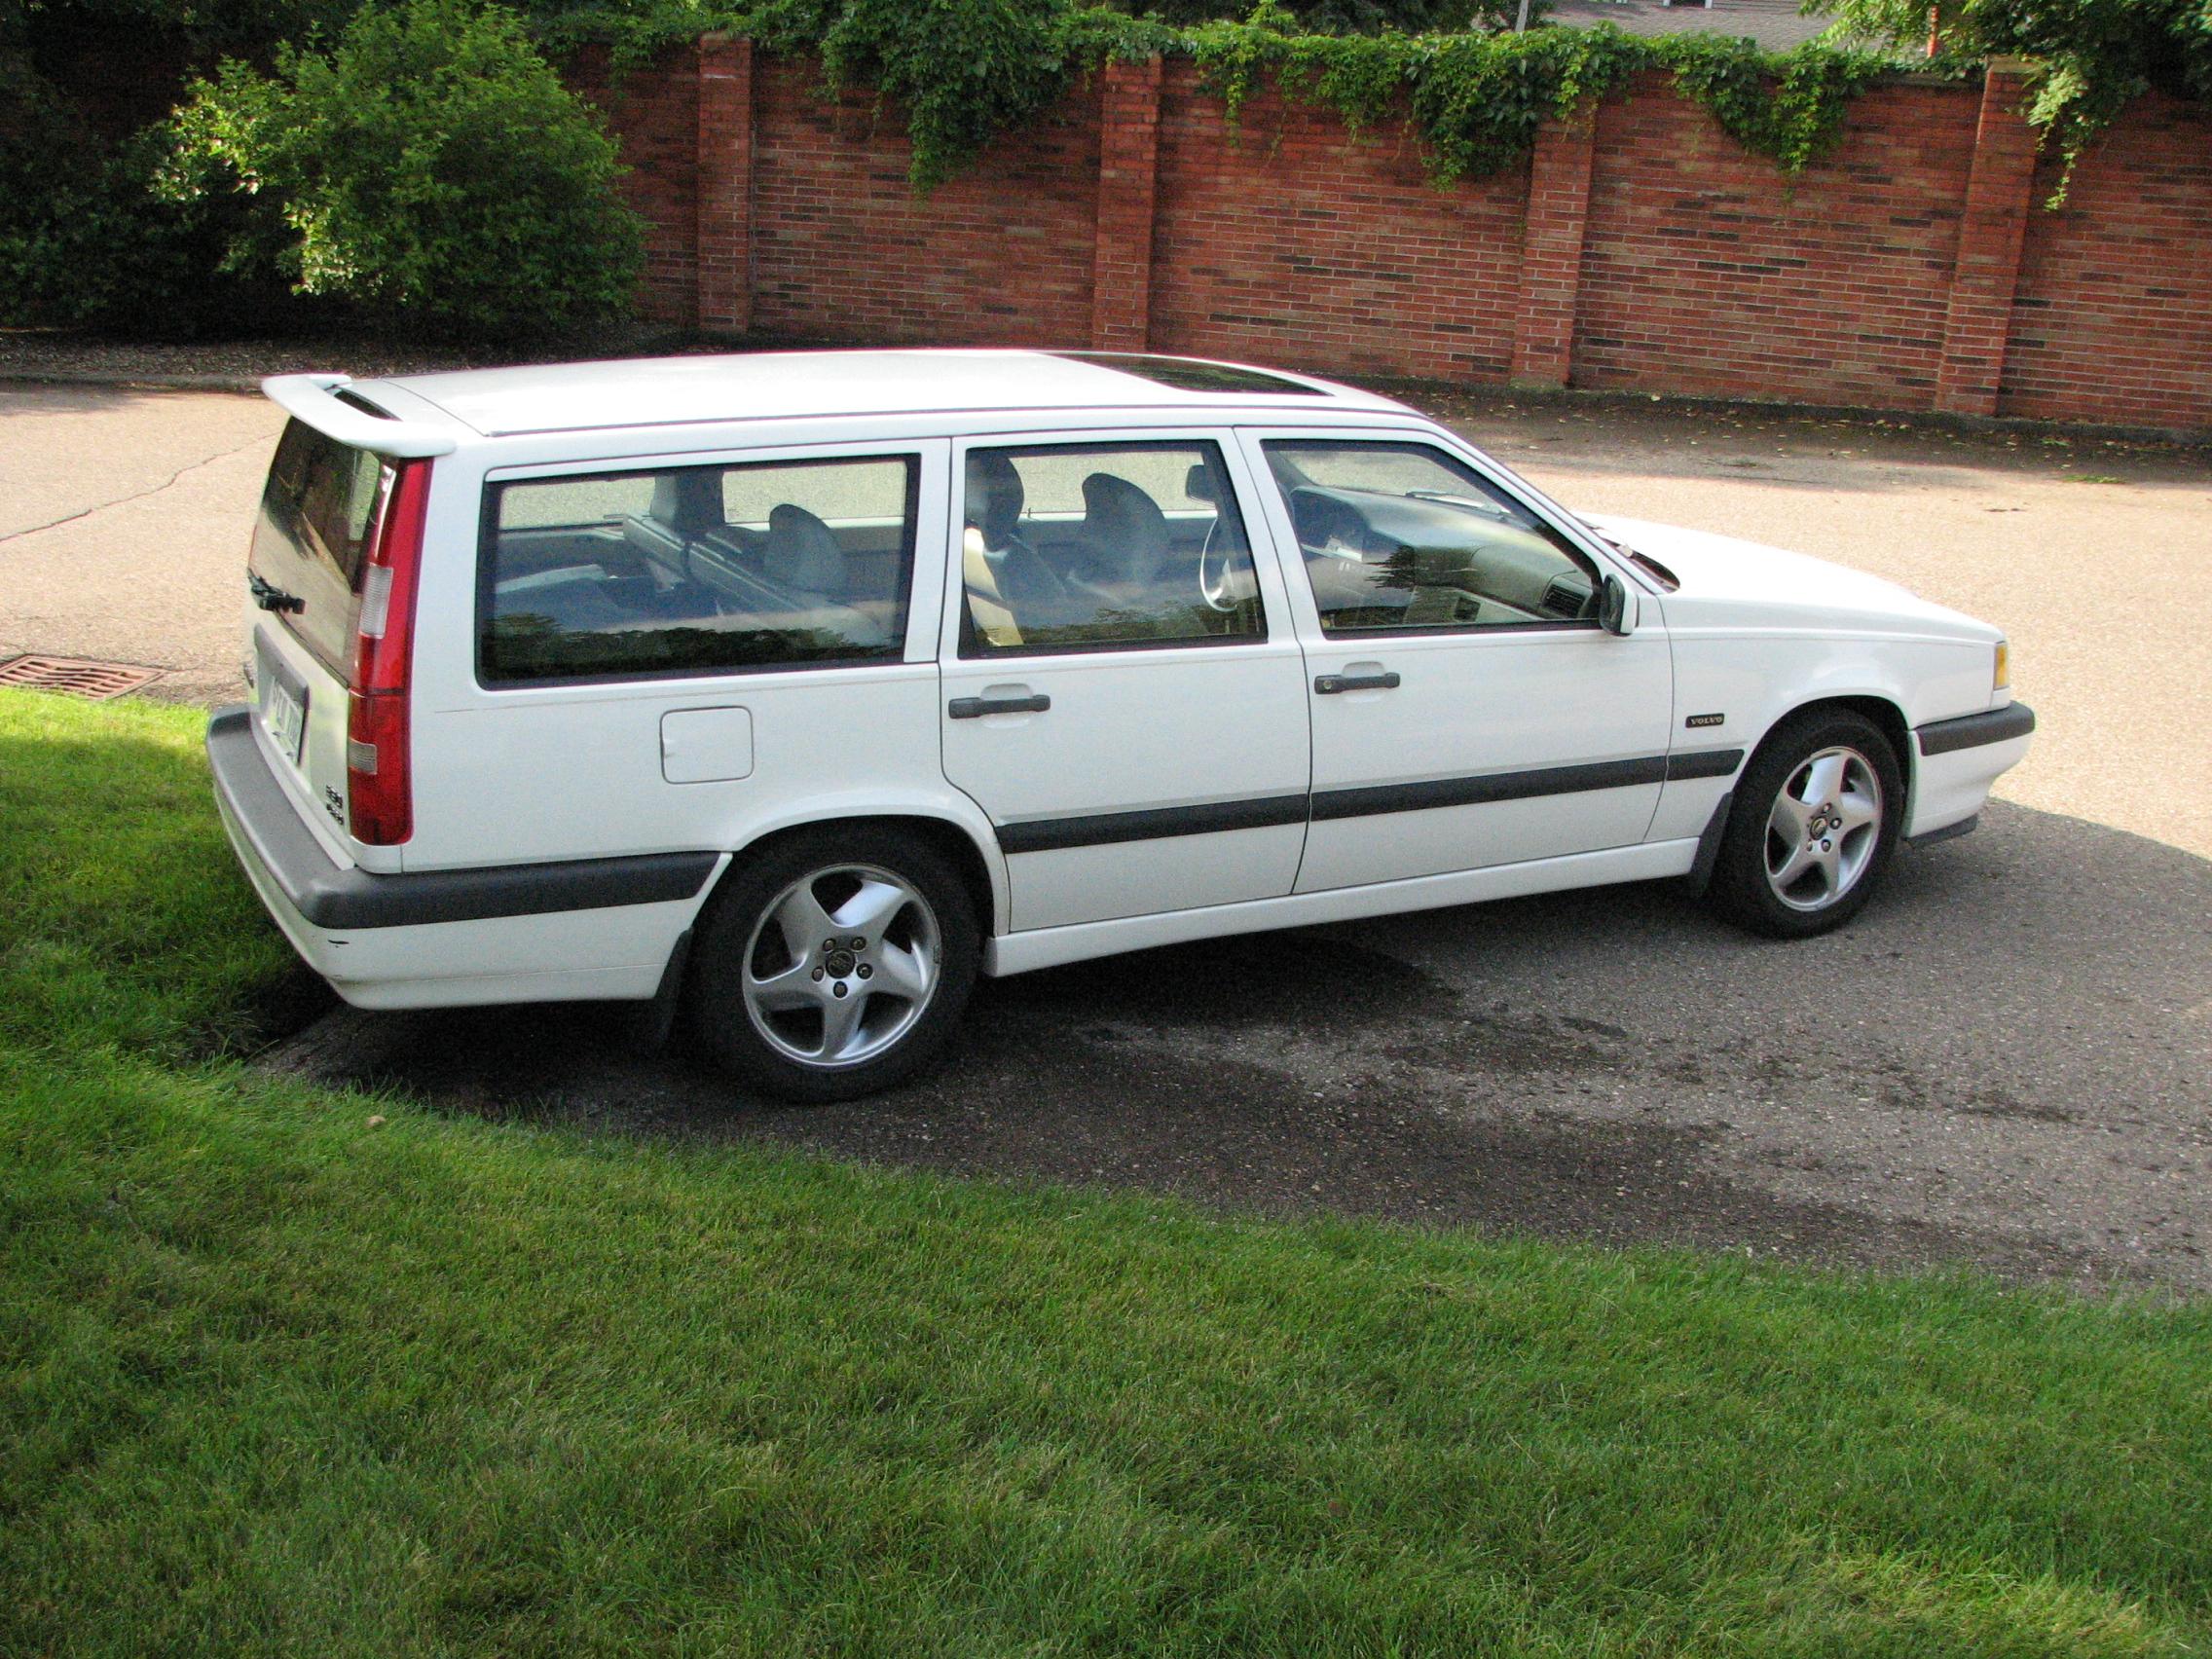 97 850 Wagon Spoiler Mounting Brackets Same As 98 V70